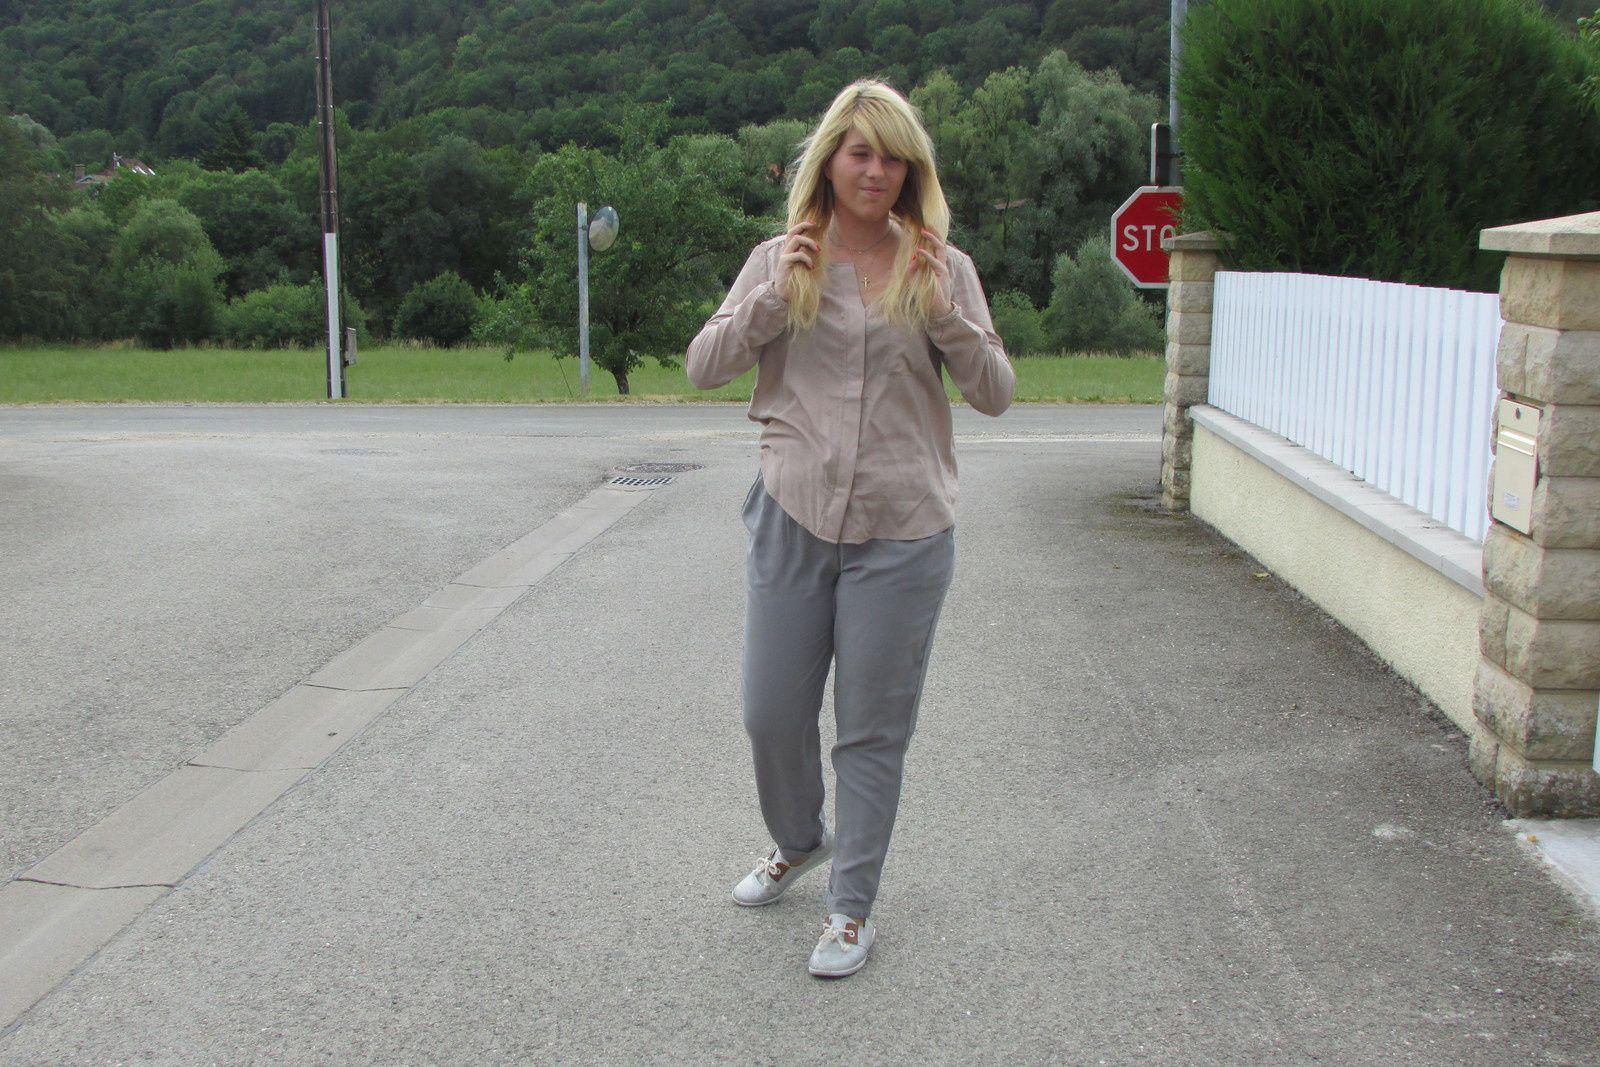 blouse : Mim / Pantalon : Pimkie / sneakers : Armistice